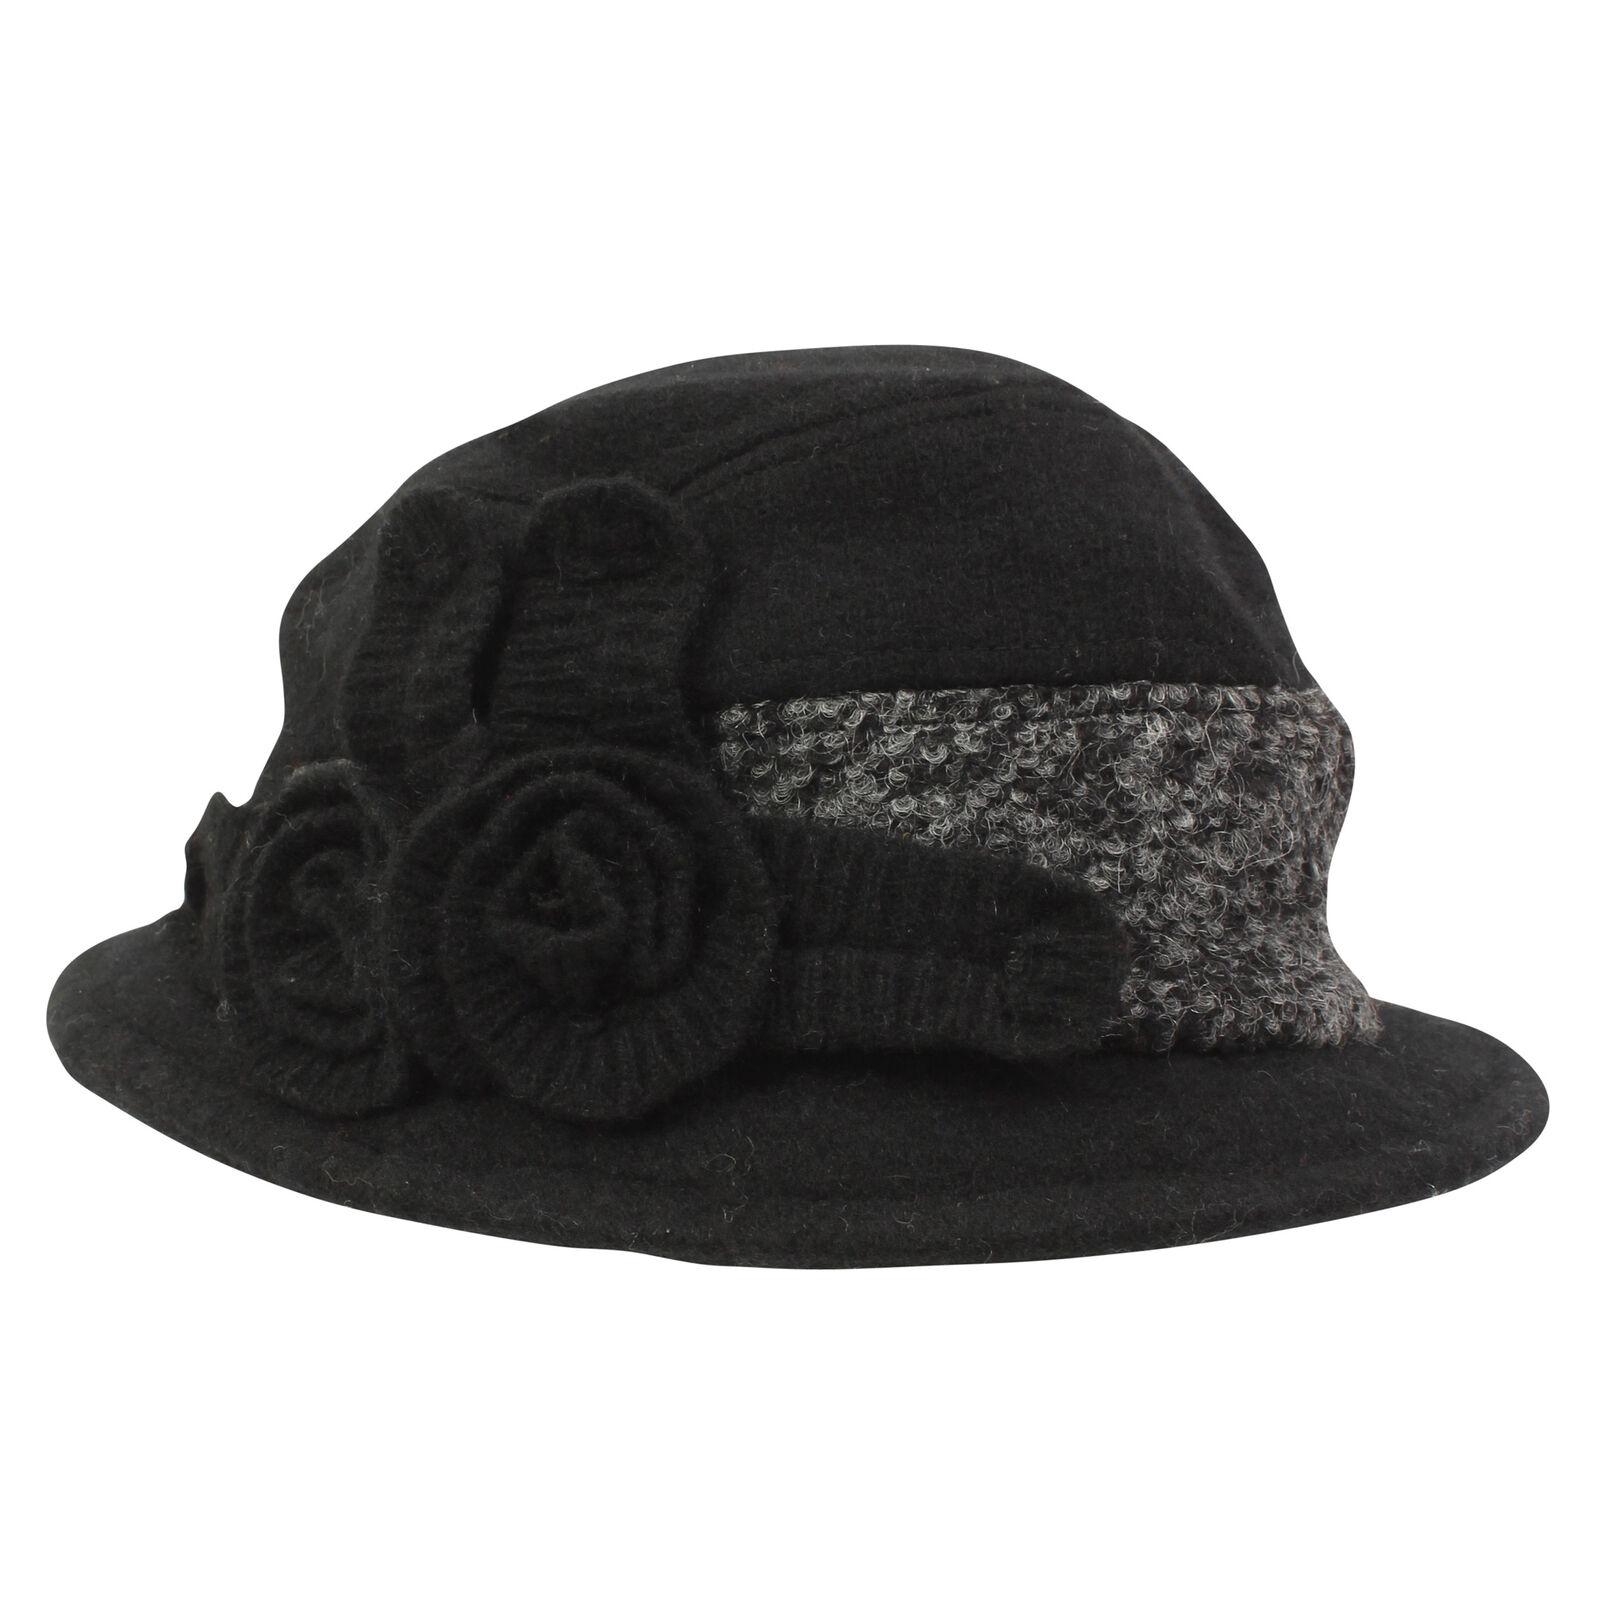 i-Smalls Women's Warm Fleece Lined Wool Felt Cloche Hat with Wool Tweed Band